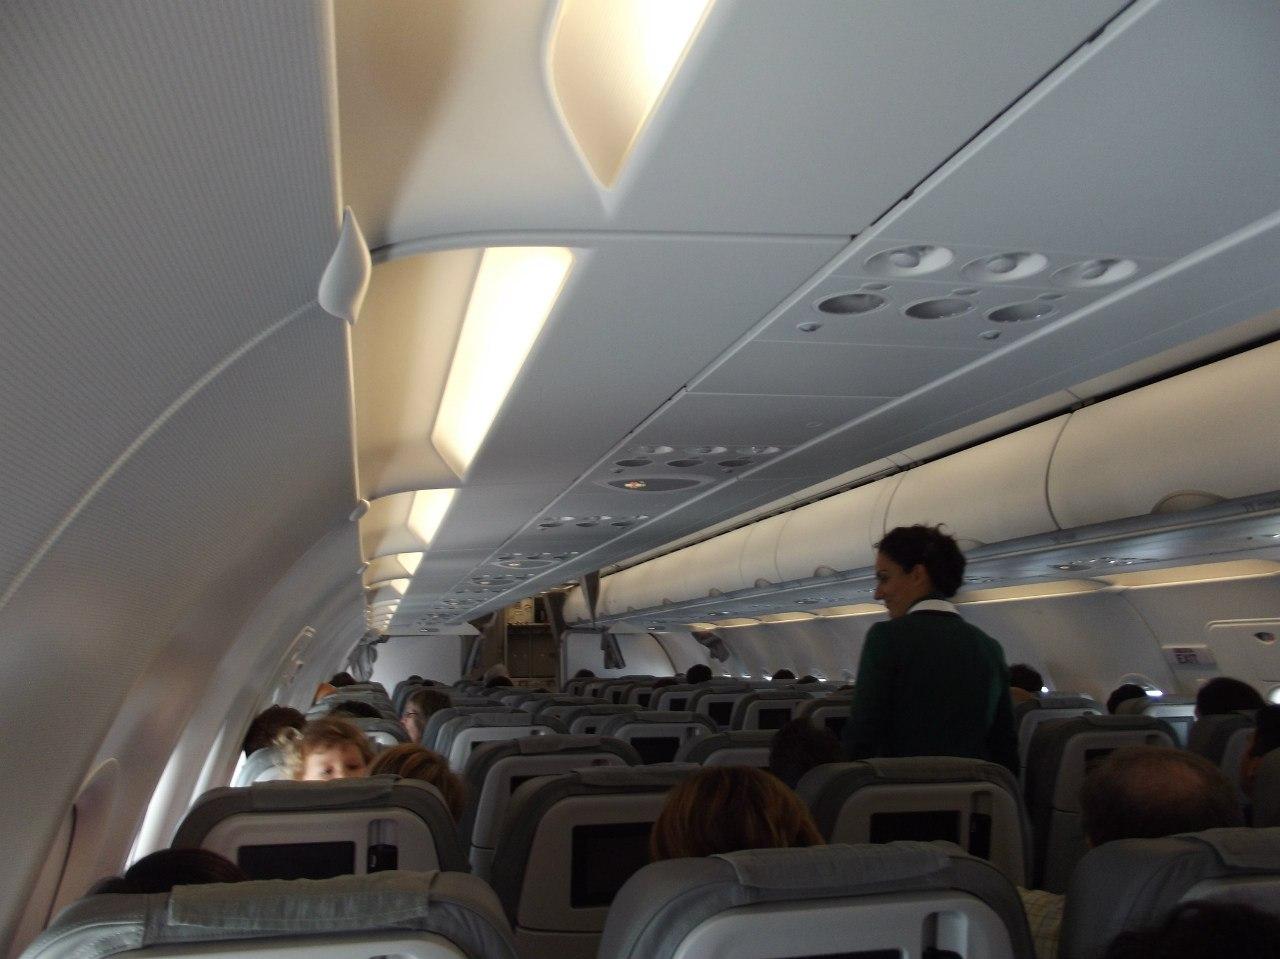 Салон самолета Airbus A319 авиакомпании Alitalia